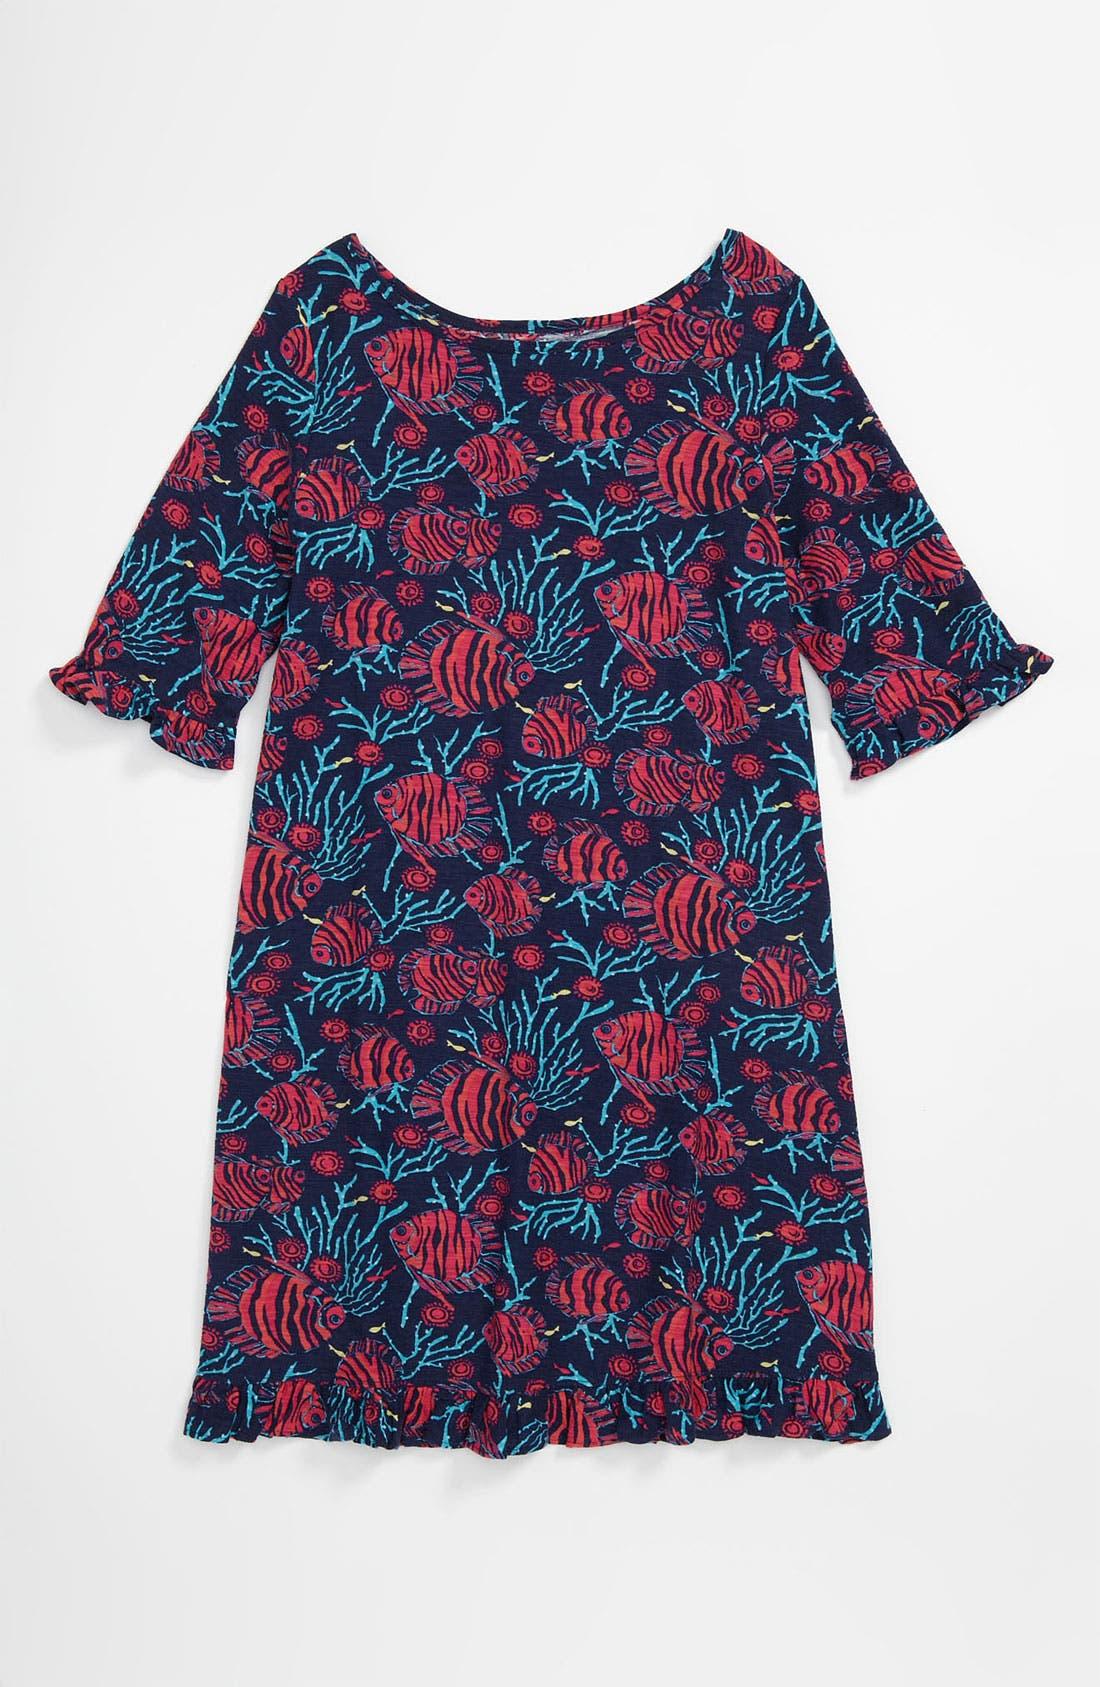 Alternate Image 1 Selected - Lilly Pulitzer® 'Linney' Dress (Little Girls & Big Girls)